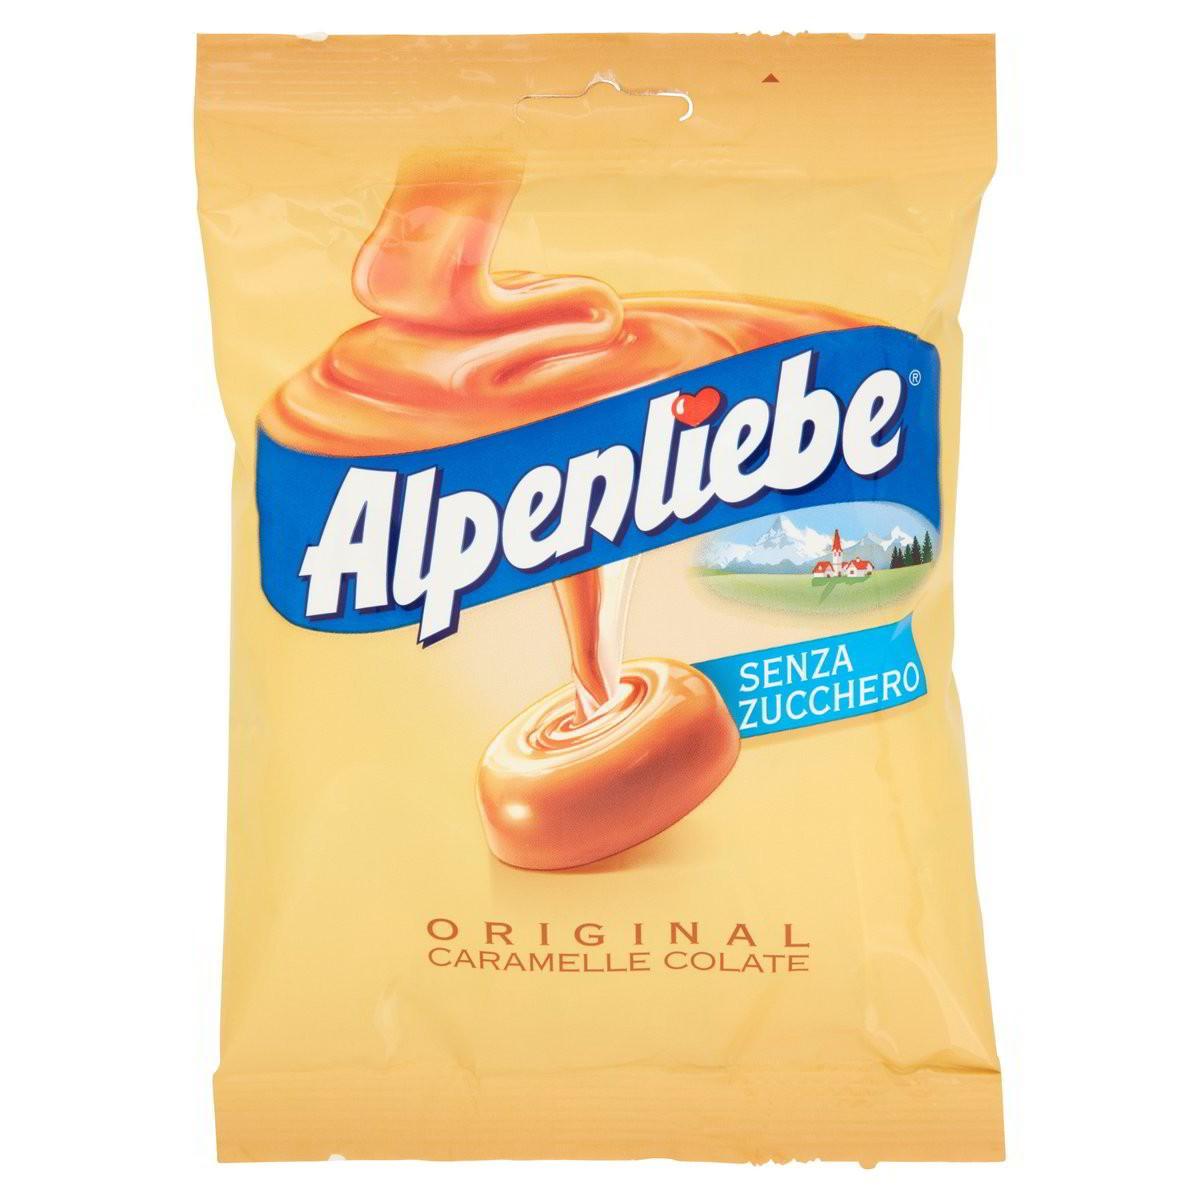 Caramelle Colate Original